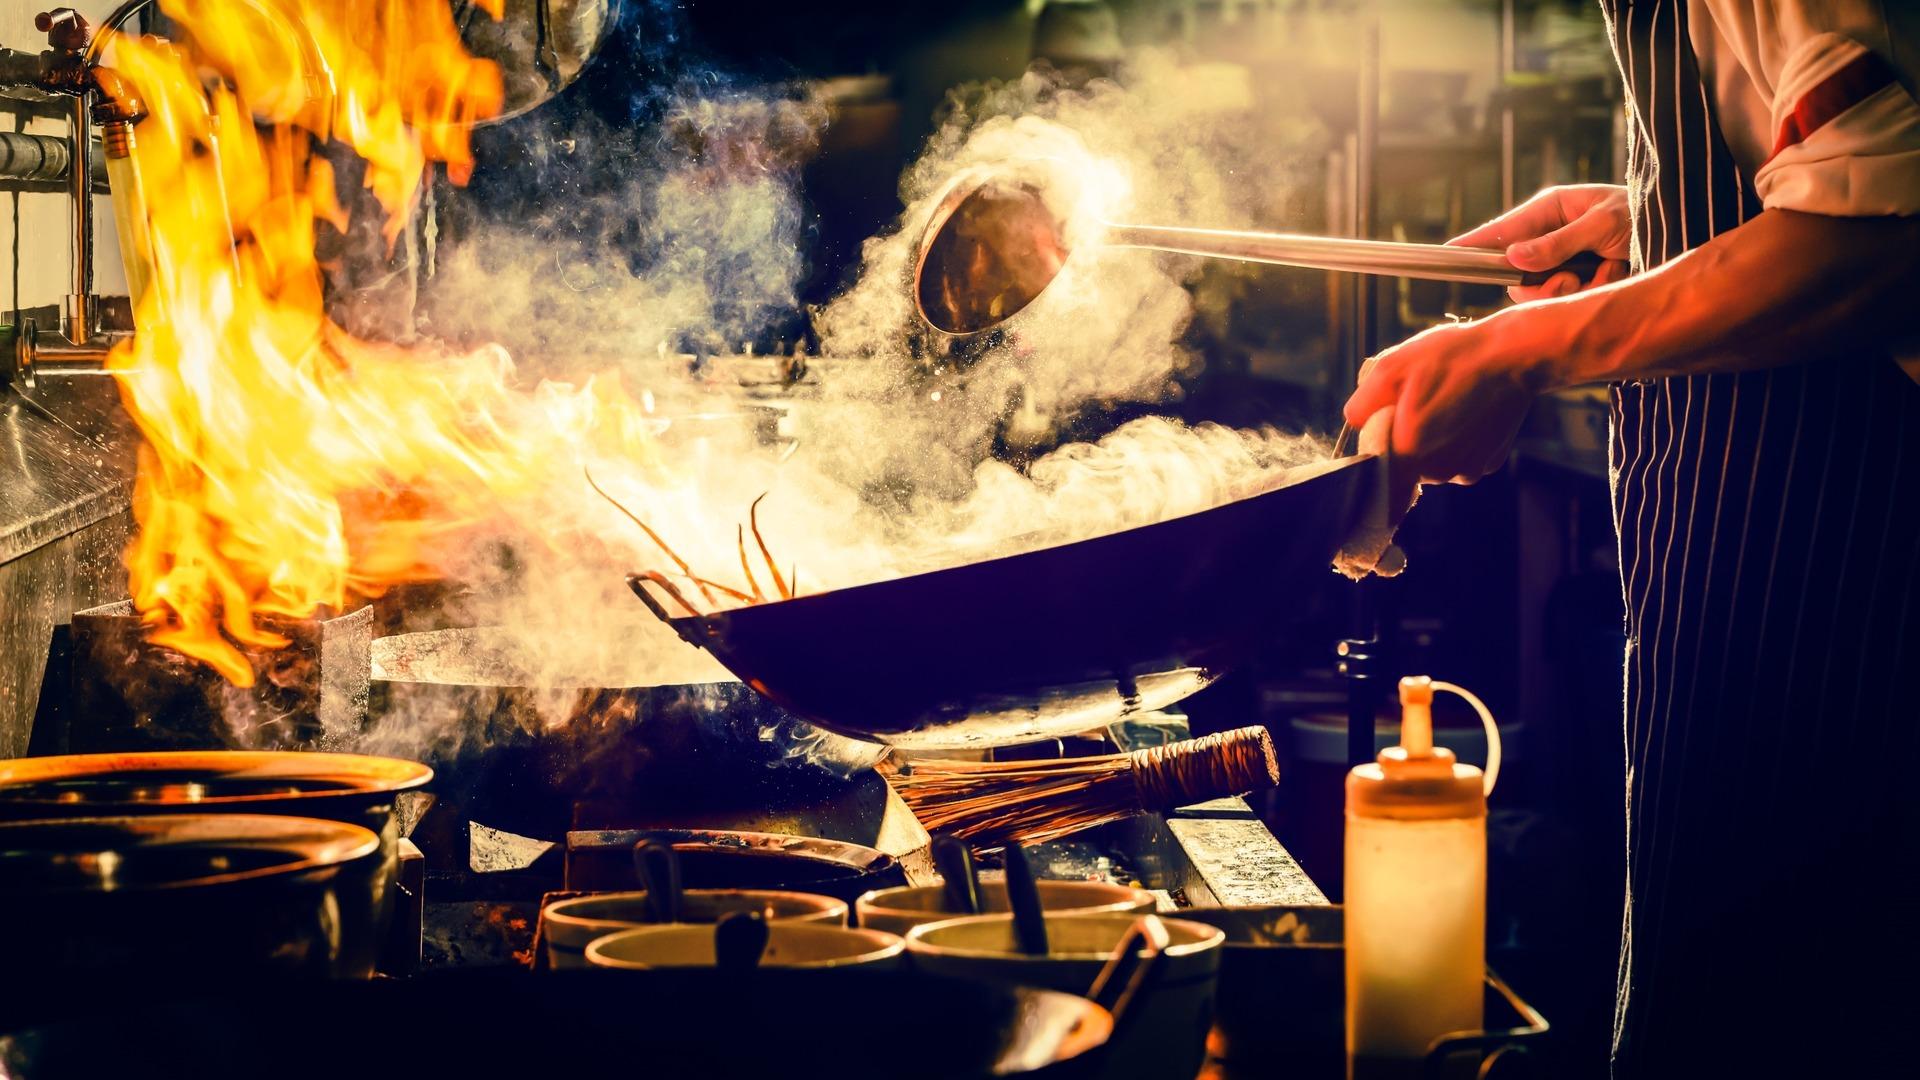 Cook using a wok